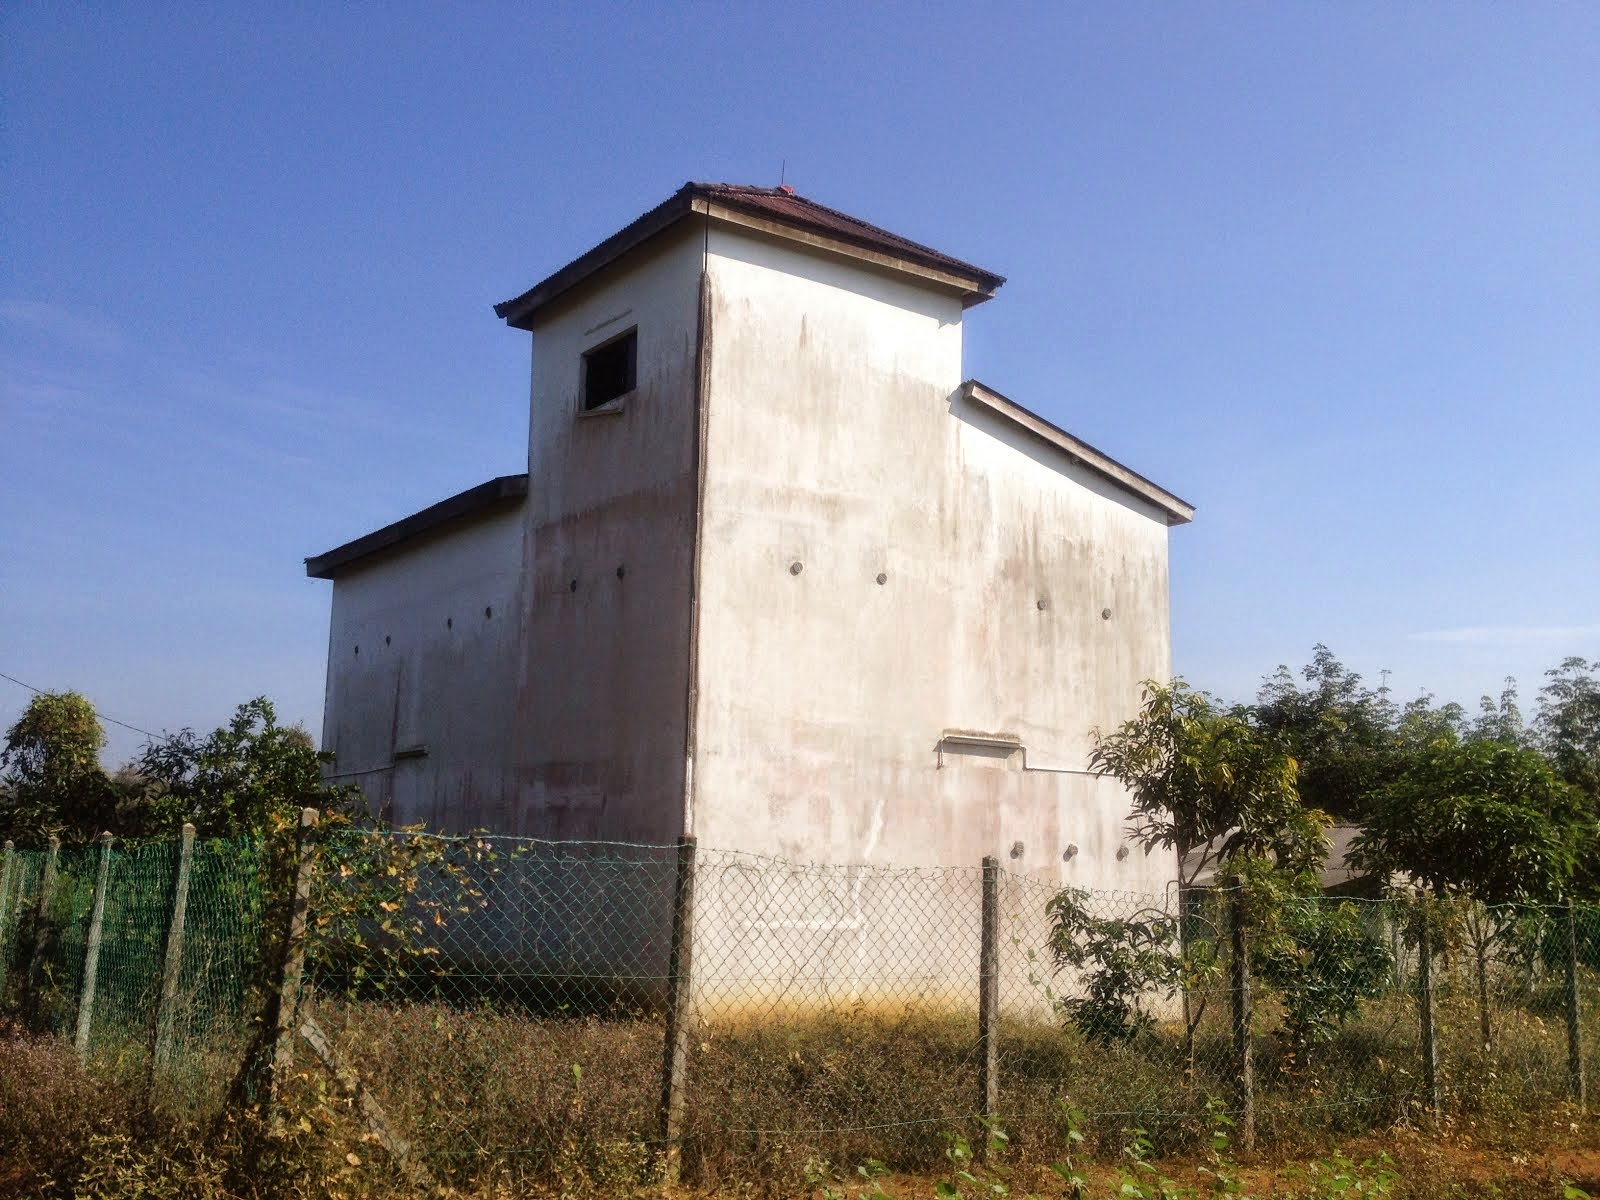 Visited An Abandoned BH At Bukit Selambau, SP, Kedah !!!